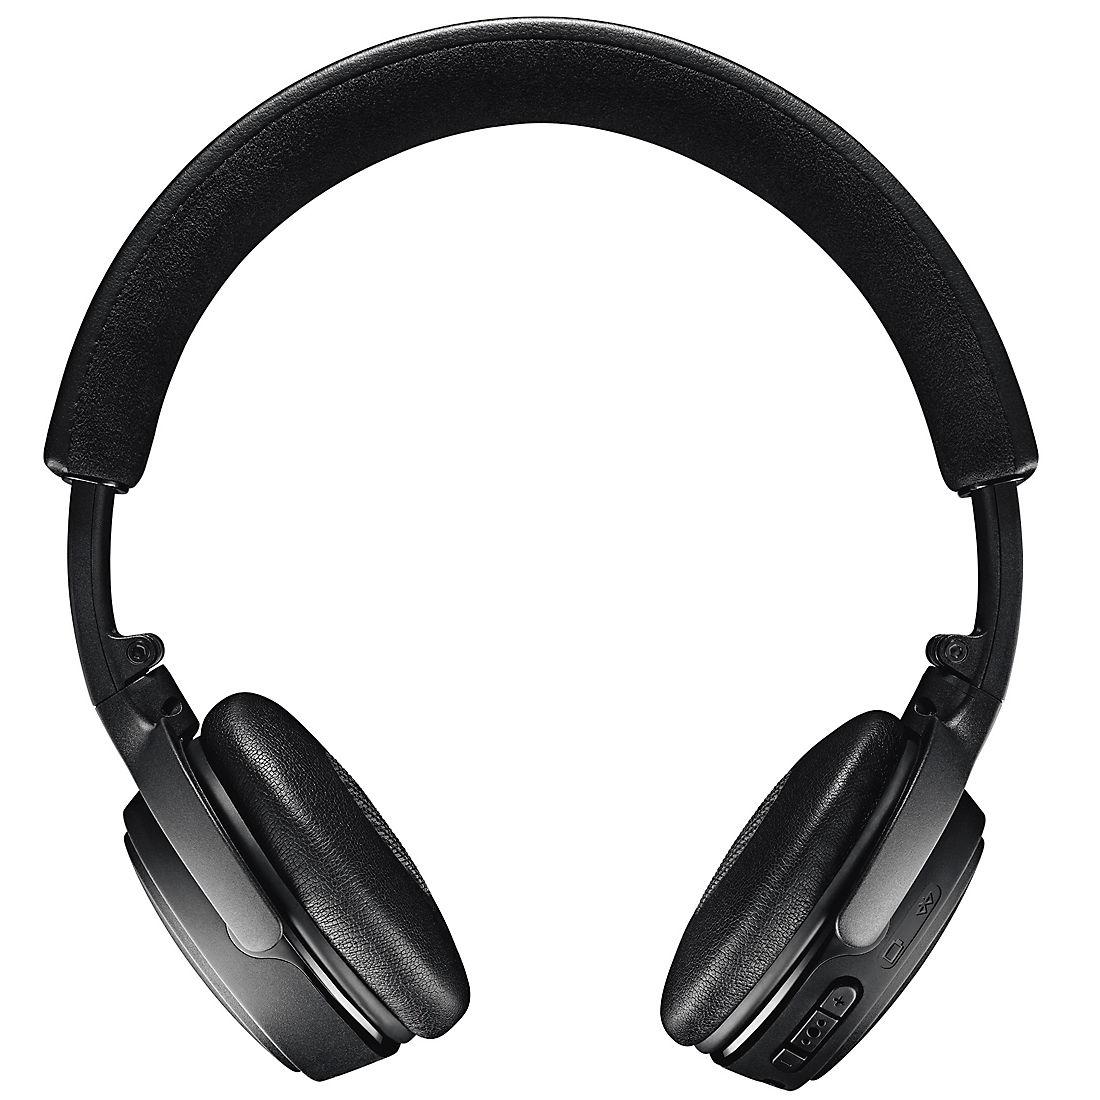 Bose On Ear Bluetooth Wireless Headphones